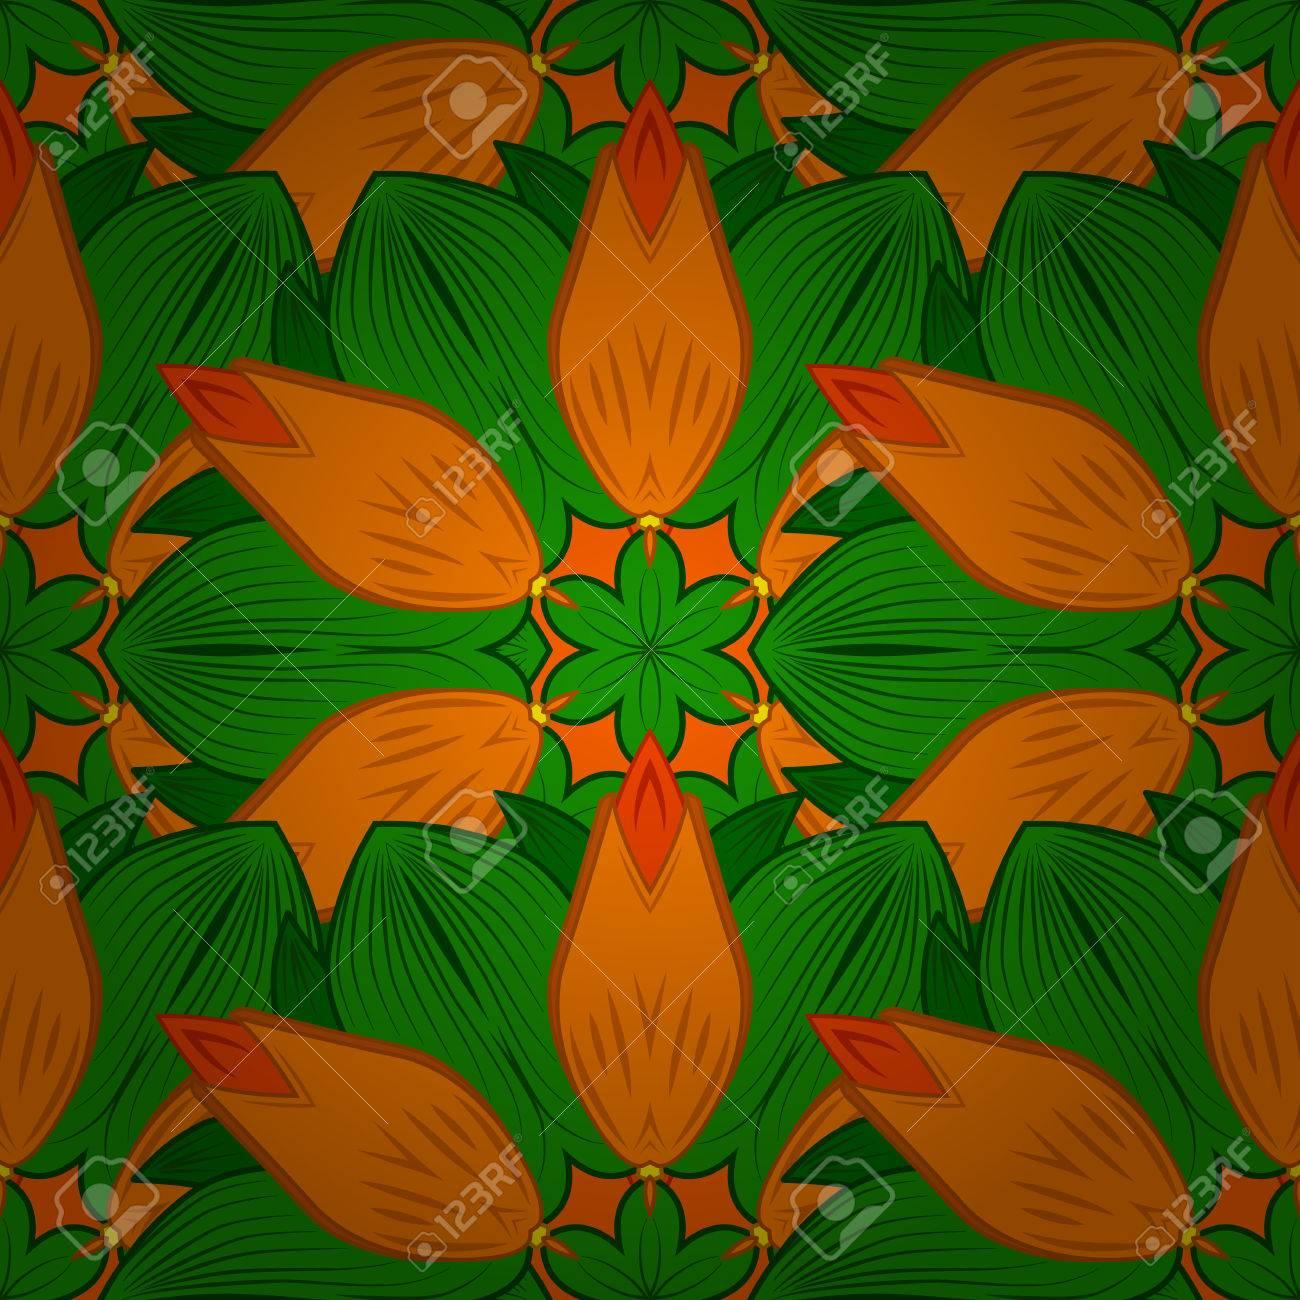 Vettoriale Seamless Motivo Floreale Mandala In Rosa Turchese